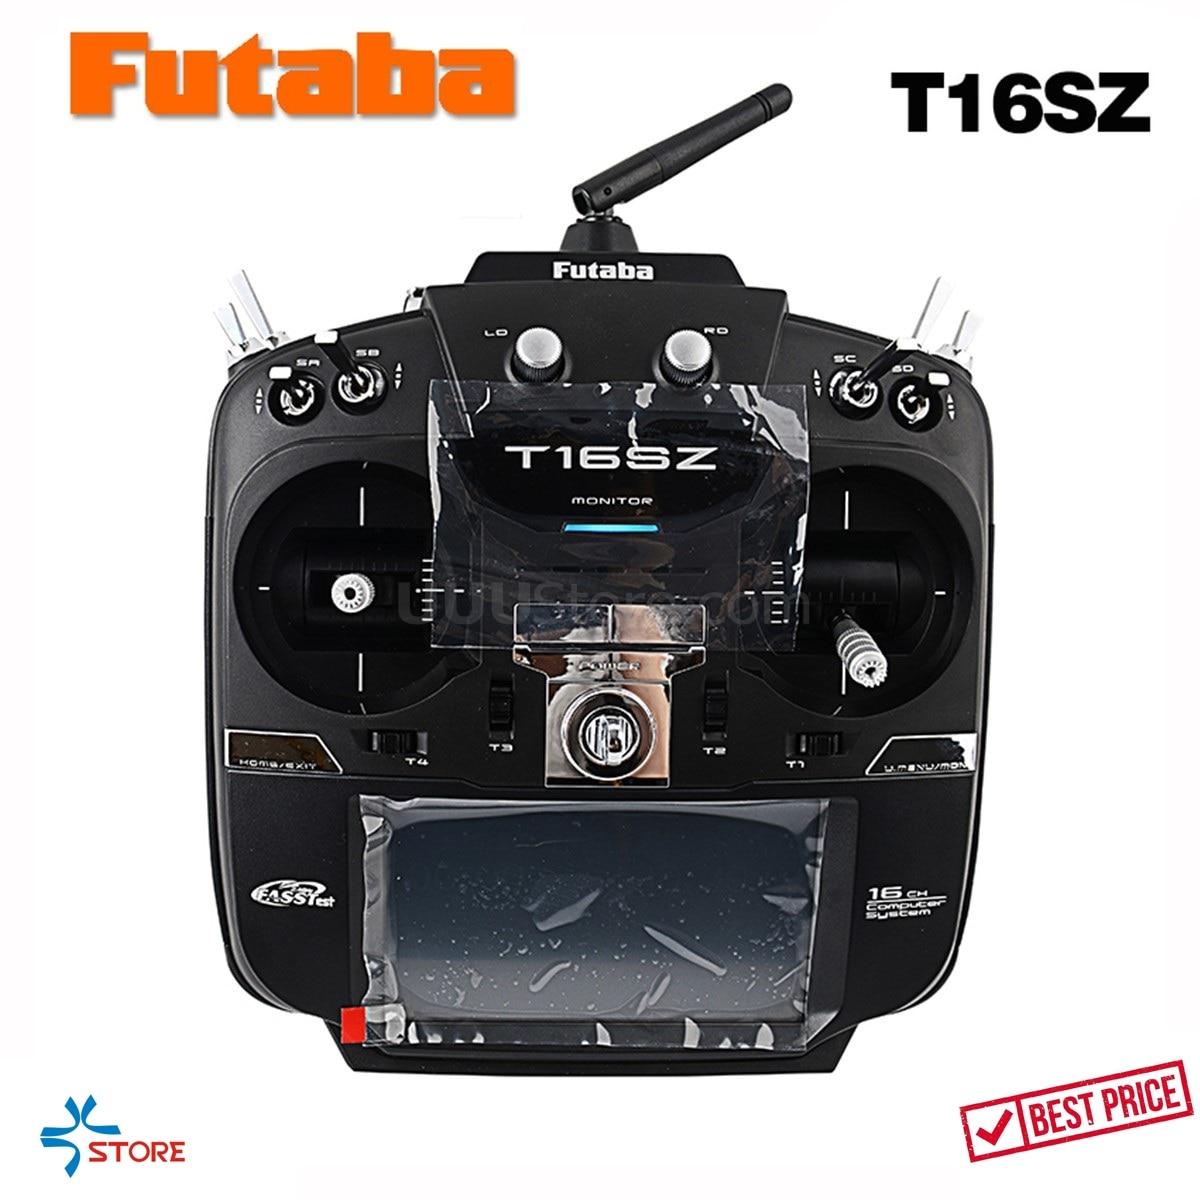 Original Futaba 16SZ 2.4GHz FASST Transmitter Remote Control (Ni-MH) R7008SB receiver RC Radio for Airplanes Helis Drones